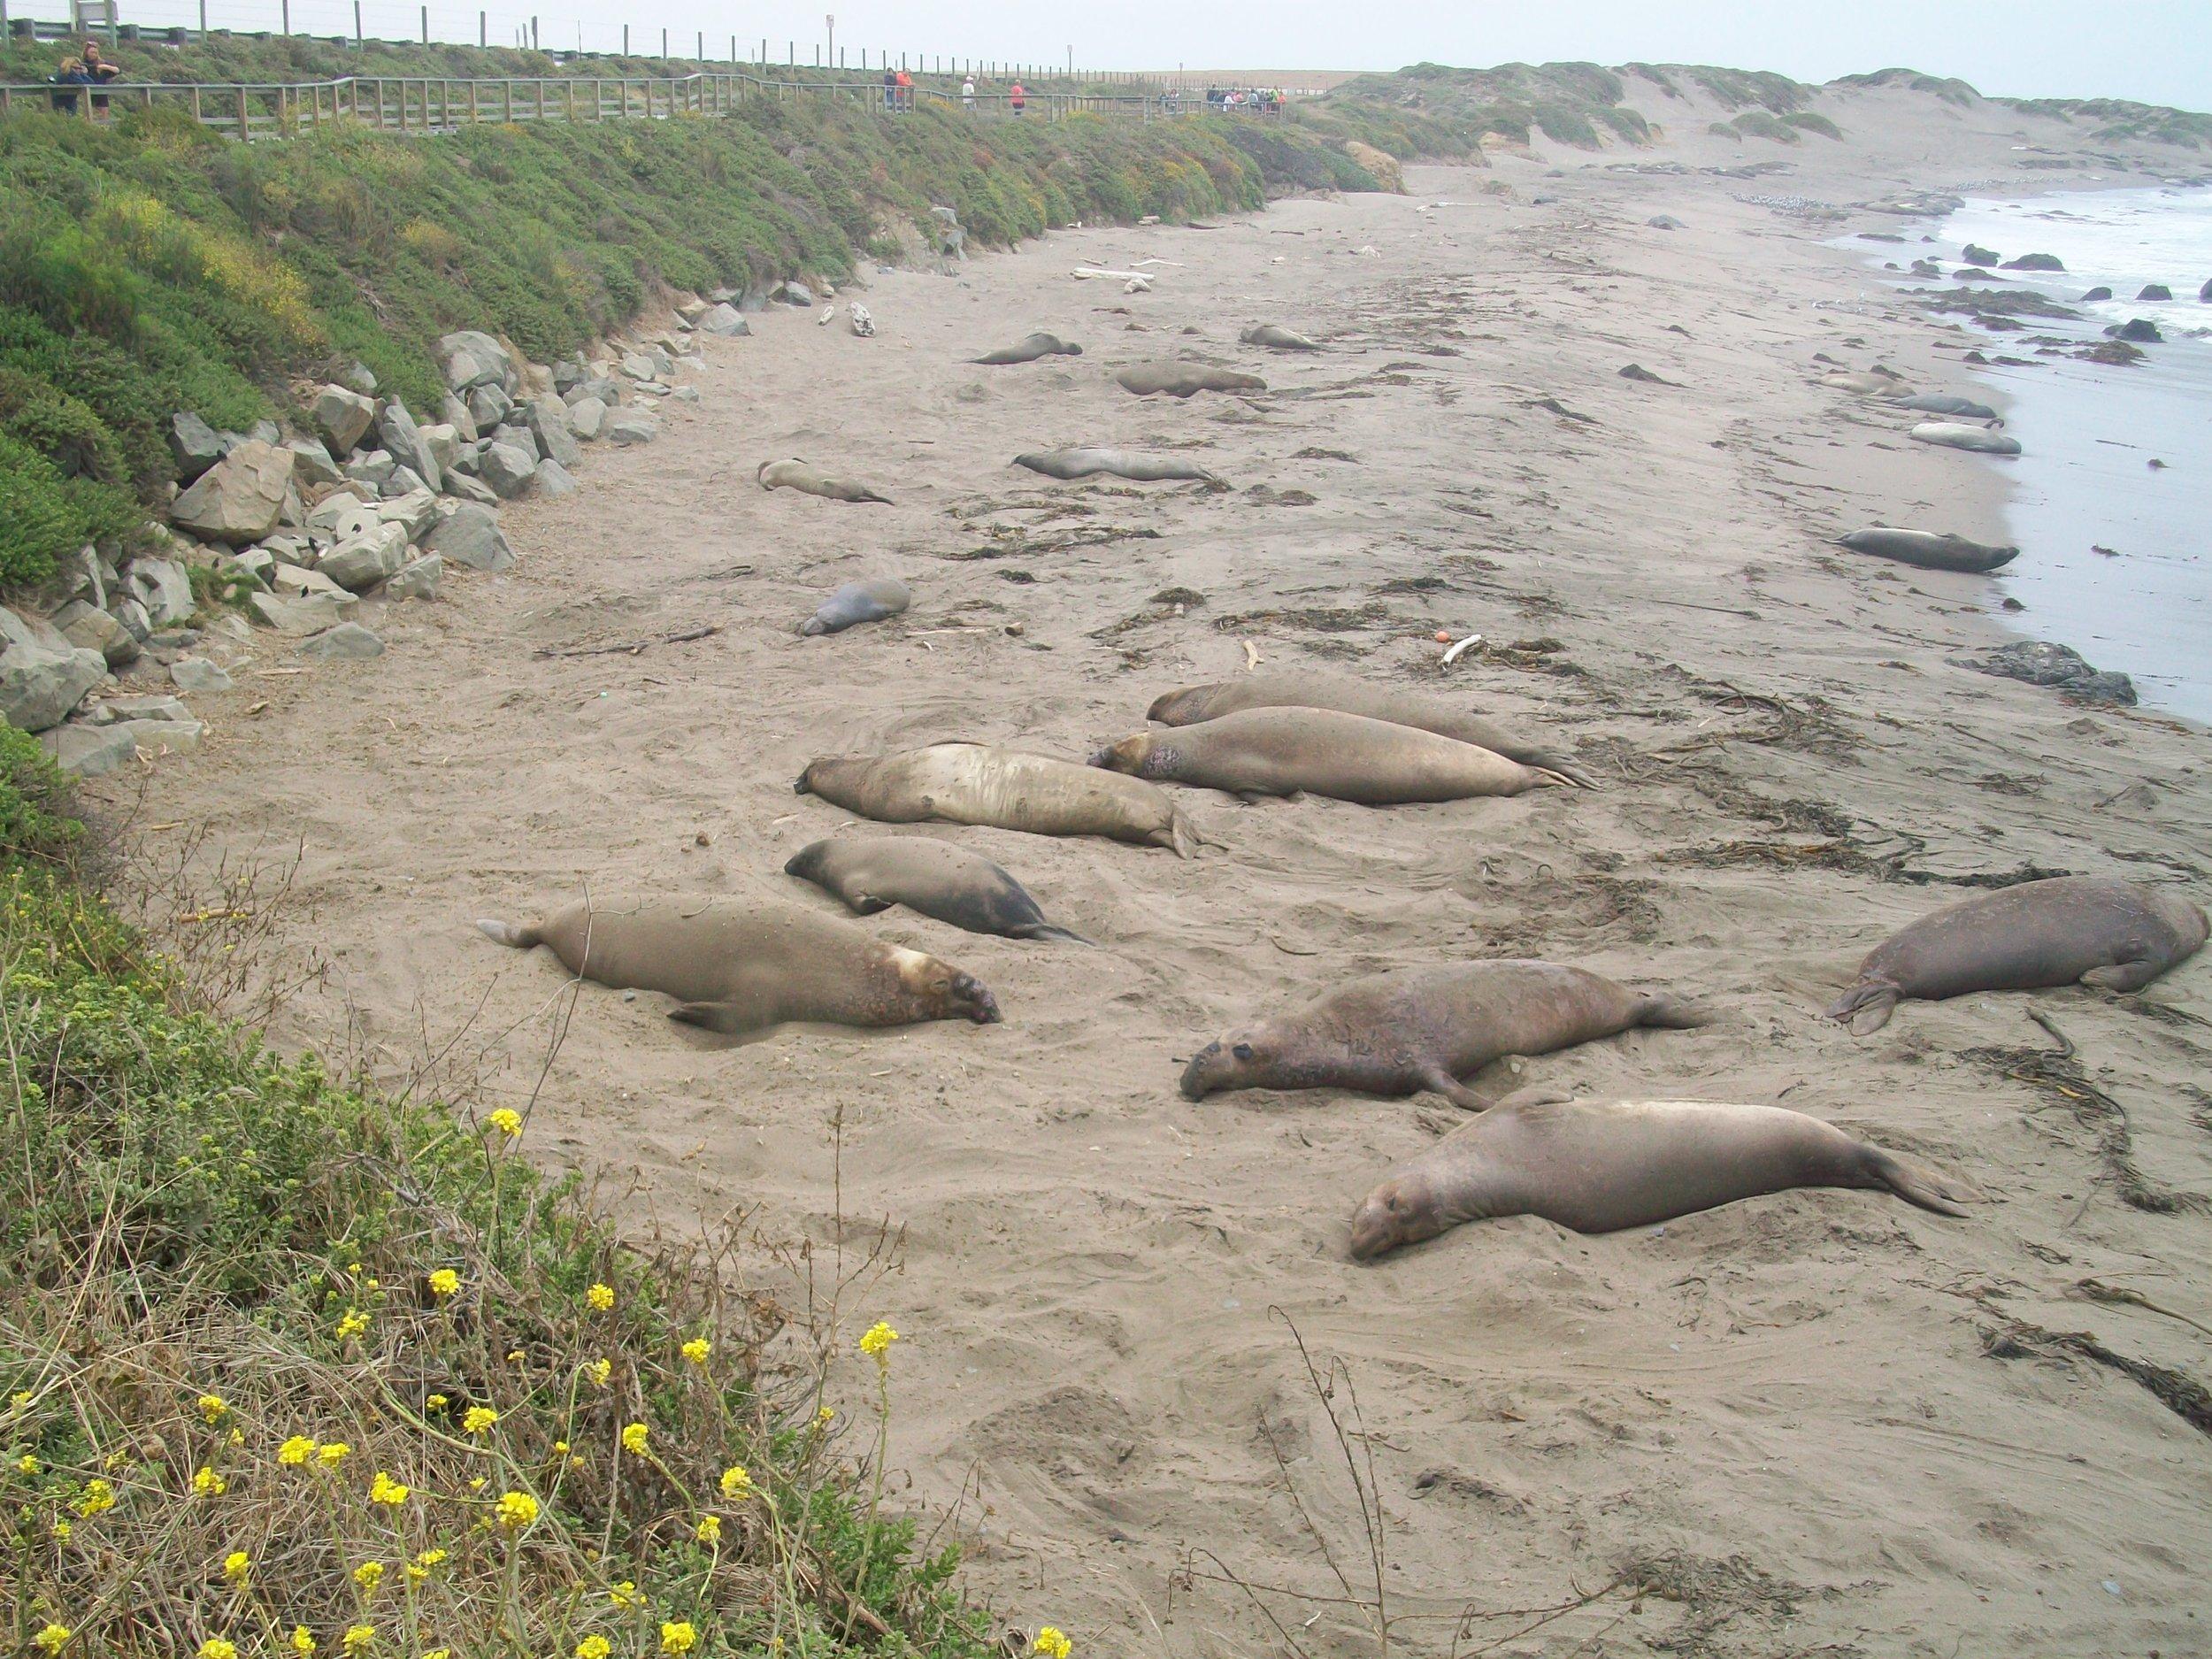 Elephant seals at peace